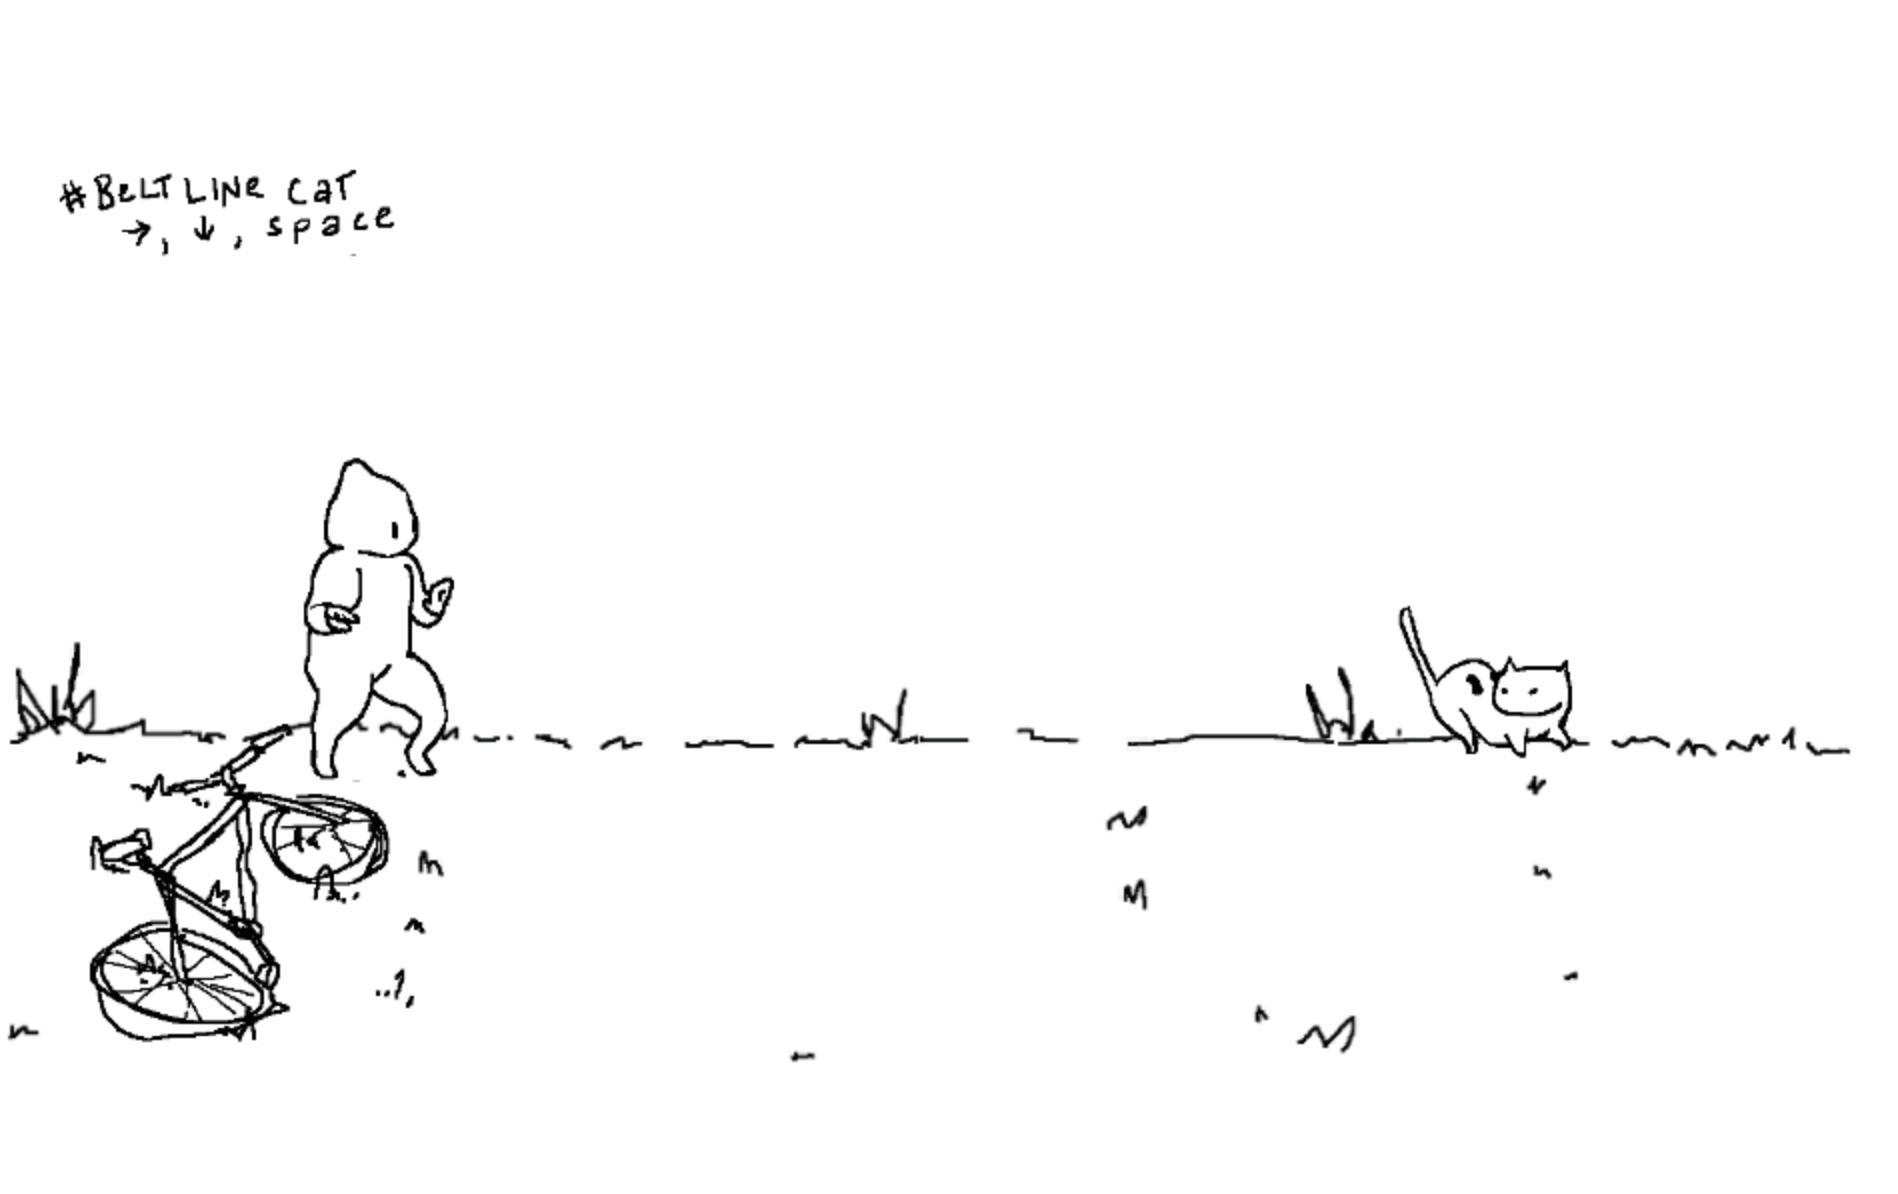 Beltline Cat